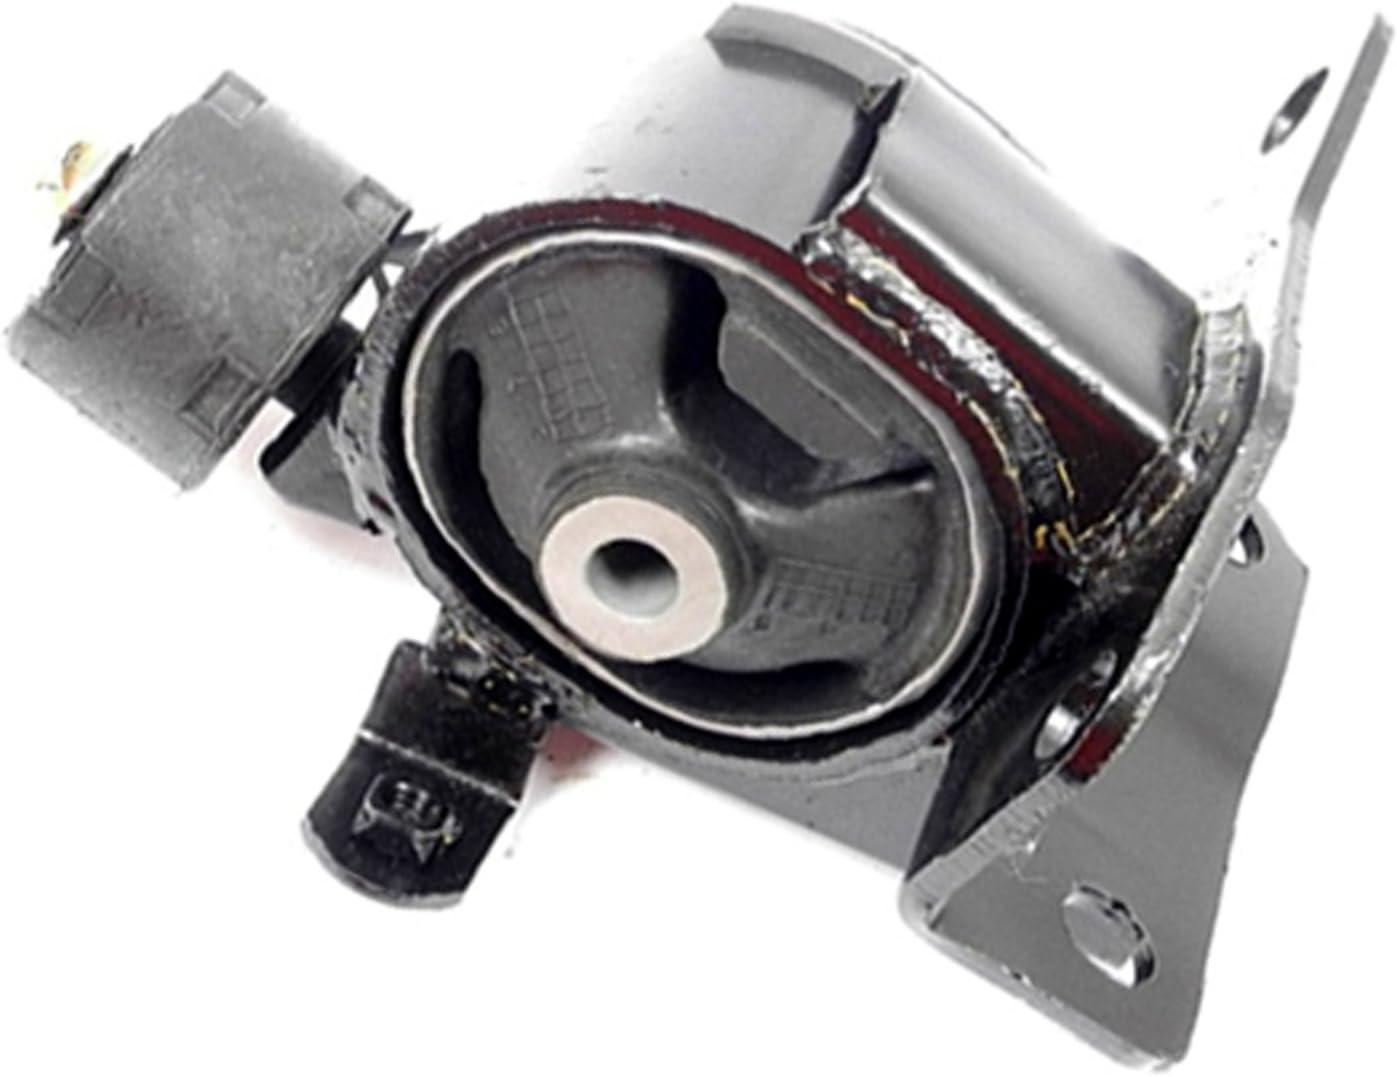 MotorKing For 2003-2008 Toyota Corolla Matrix 1.8 Engine Motor Mount Rear MK4220